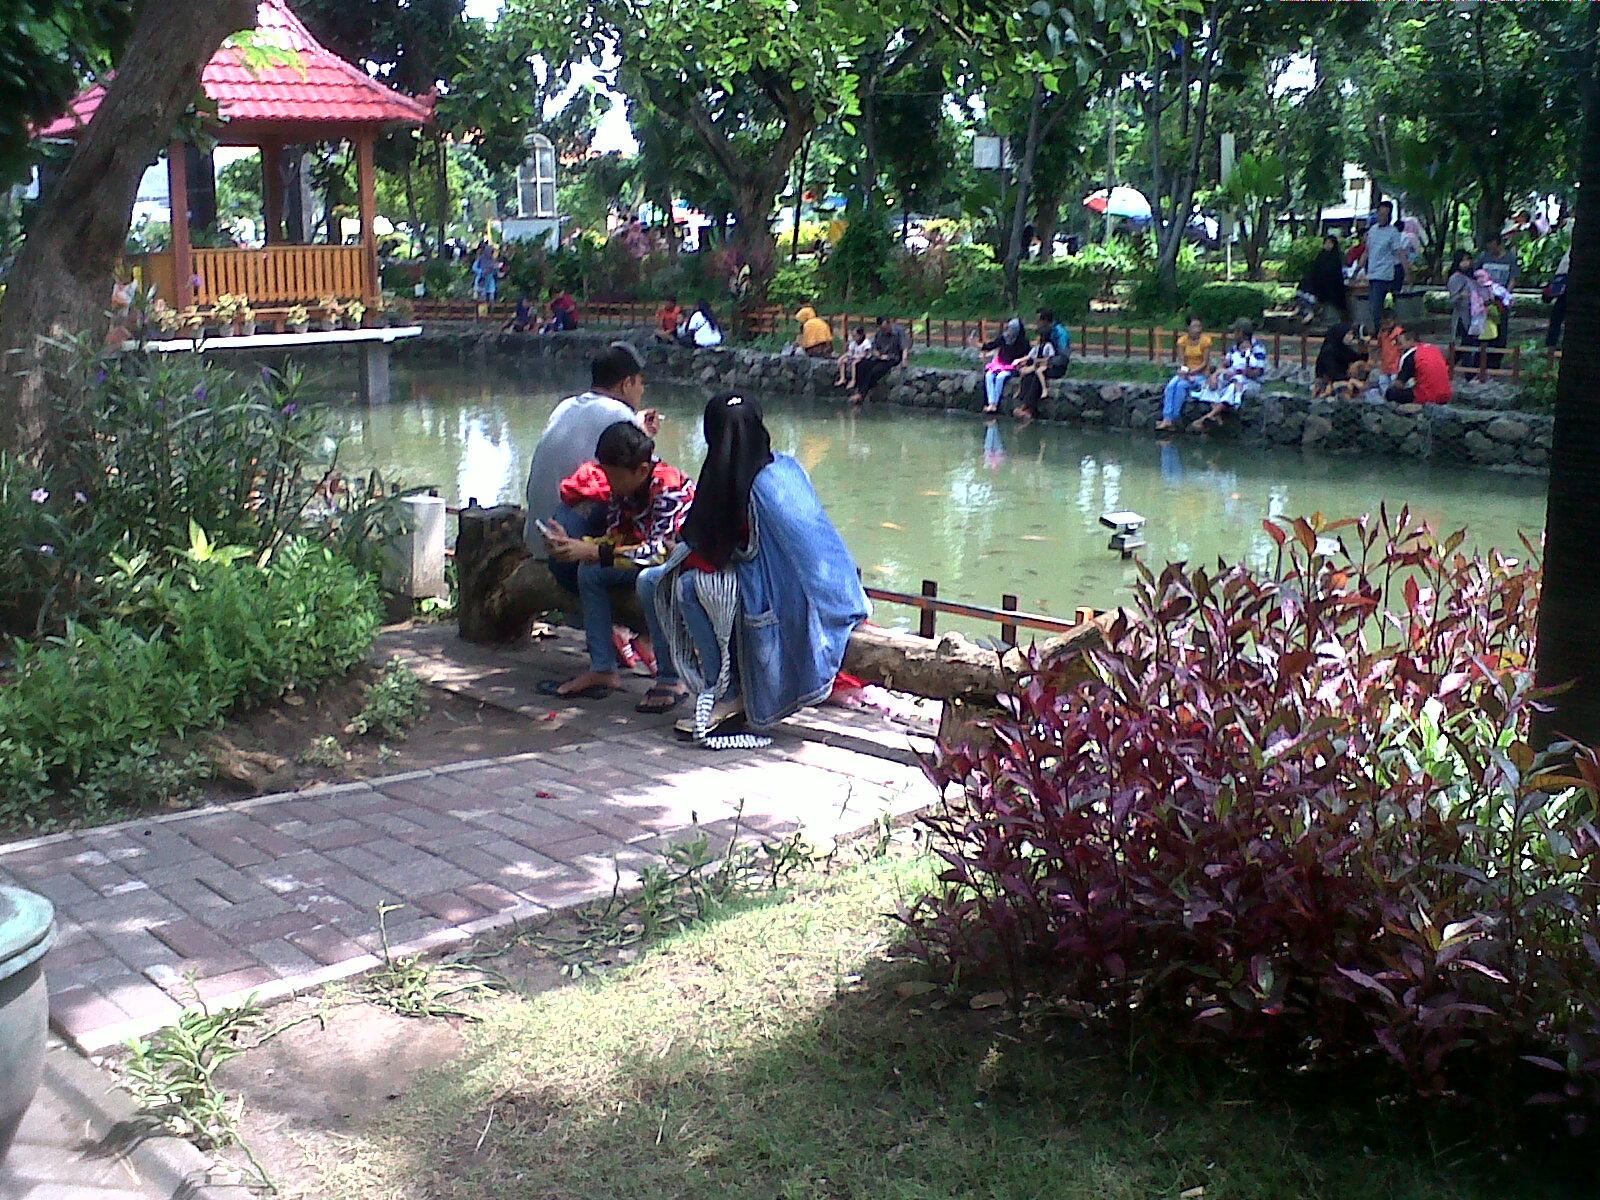 Review Wisata Taman Abhirama Sidoarjo Adek Suka Lihat Ikan Kab